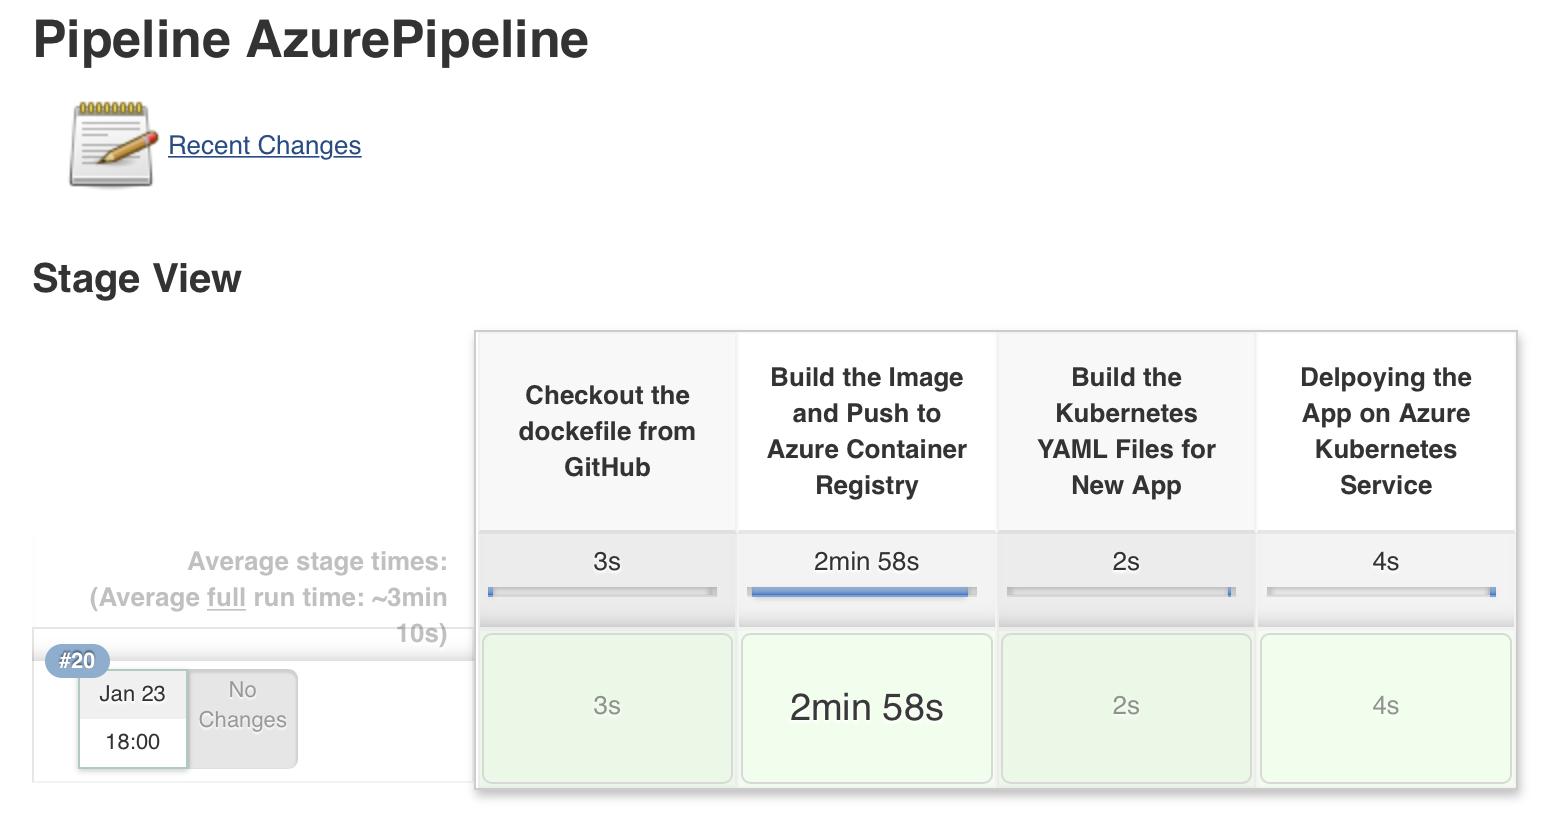 Azure Pipeline